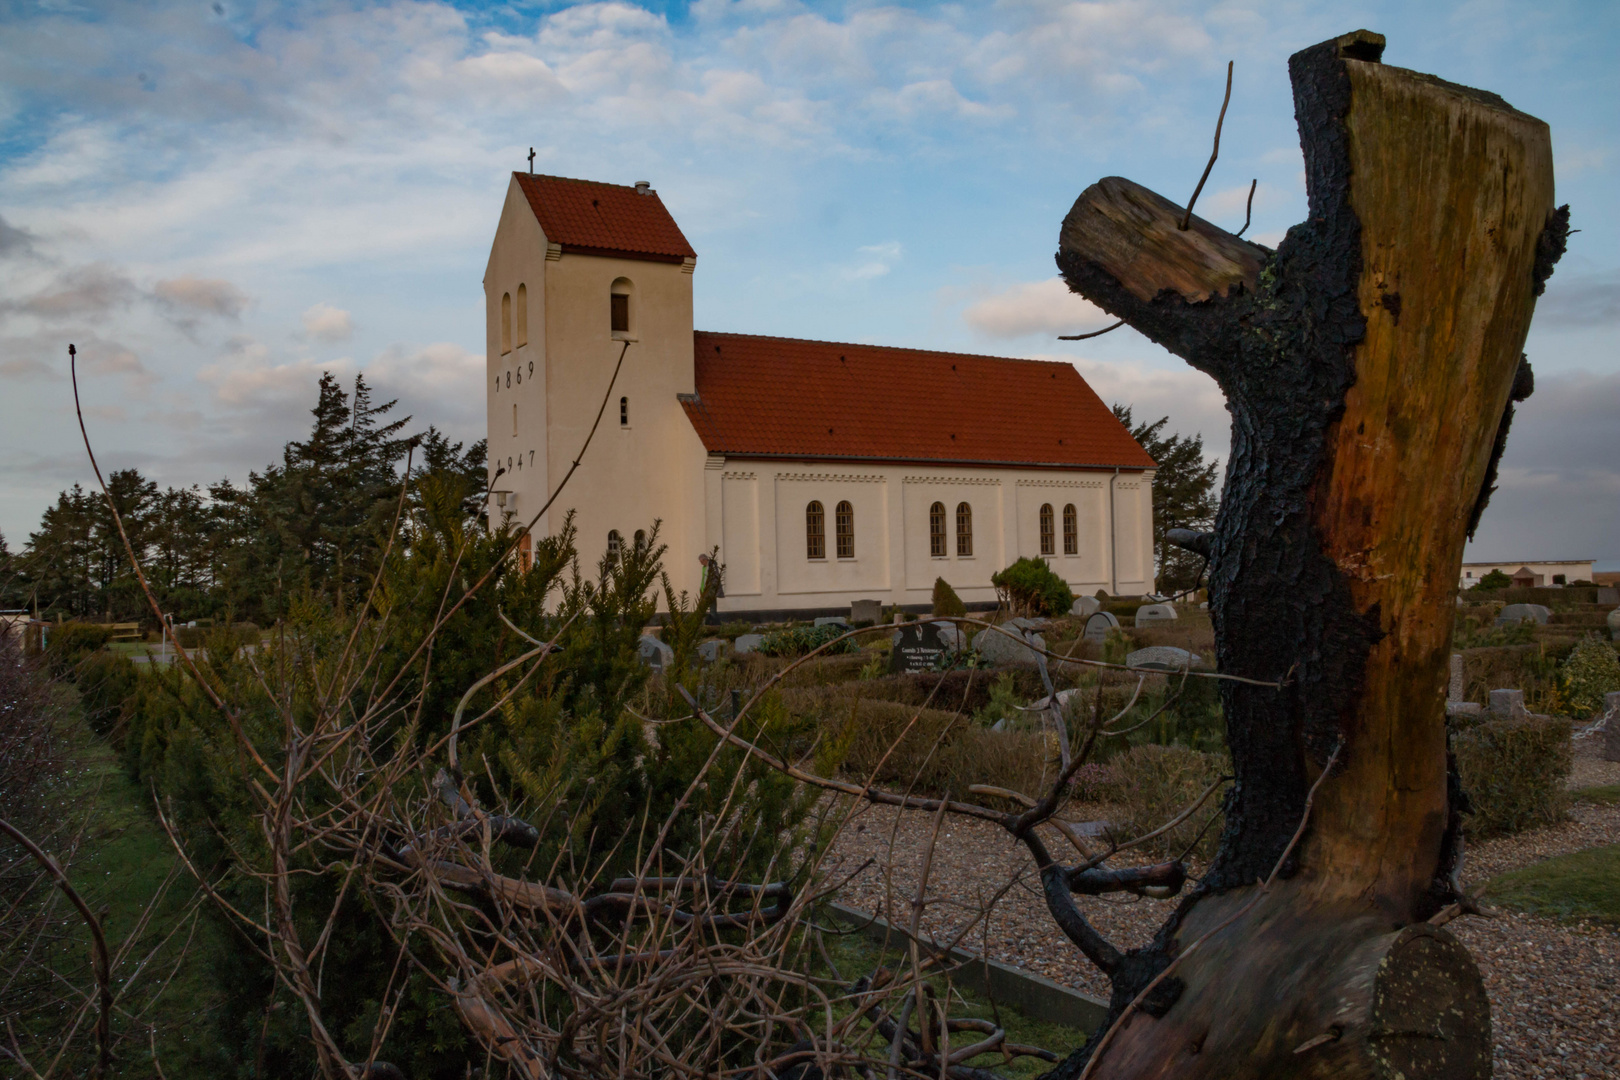 Haurvig Kirke bei Hvide Sande